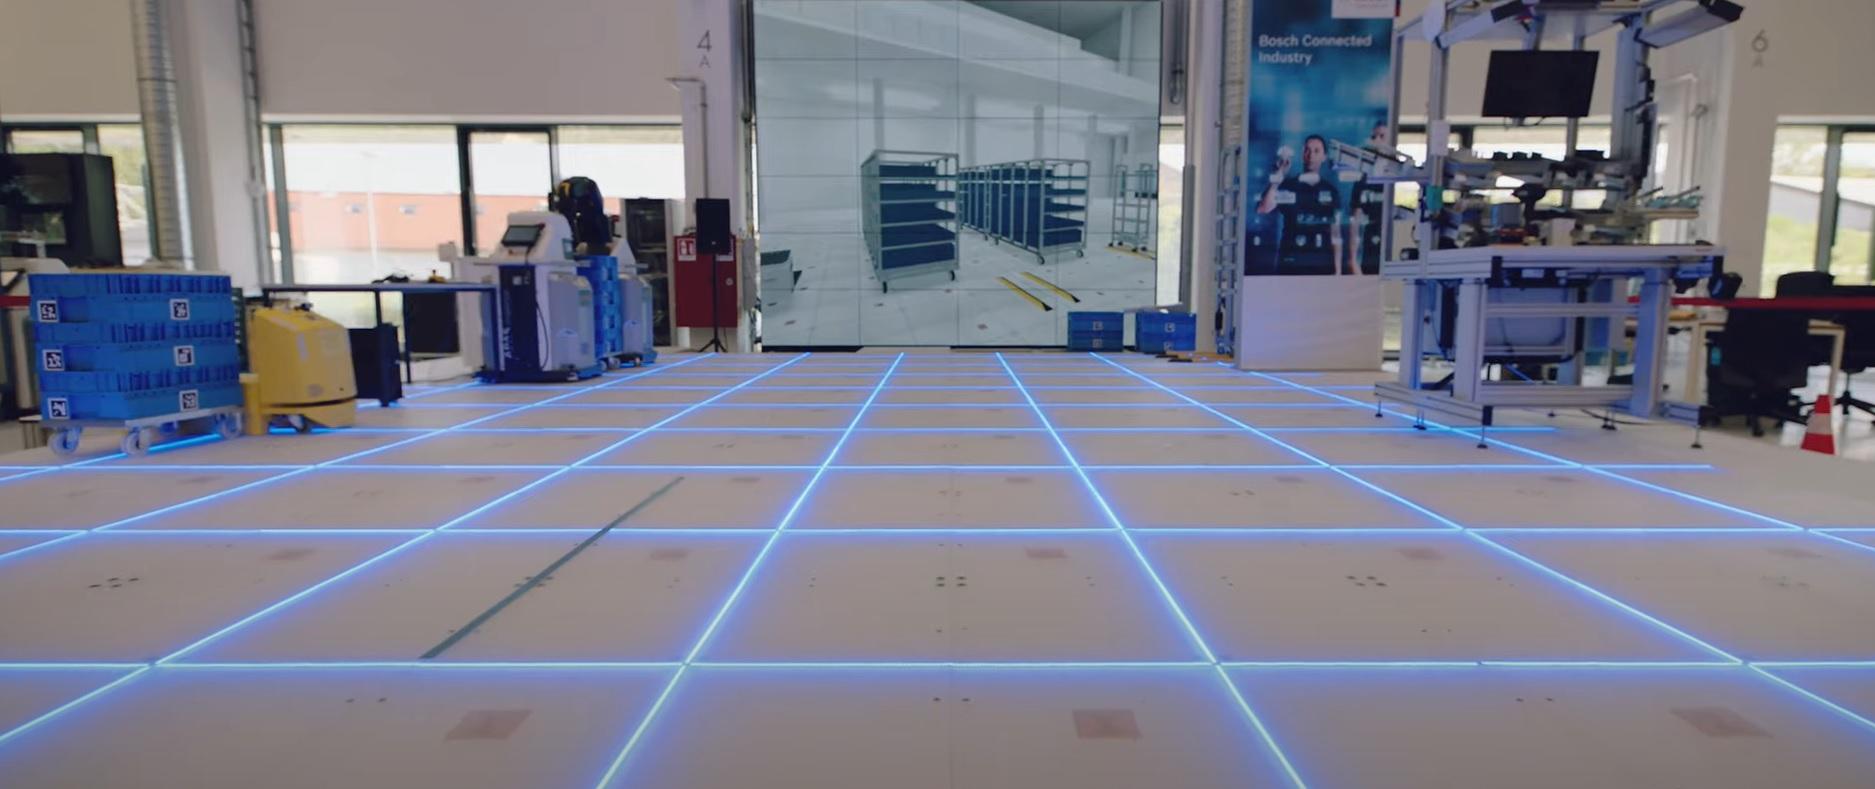 Továreň budúcnosti počíta s inteligentnou podlahou